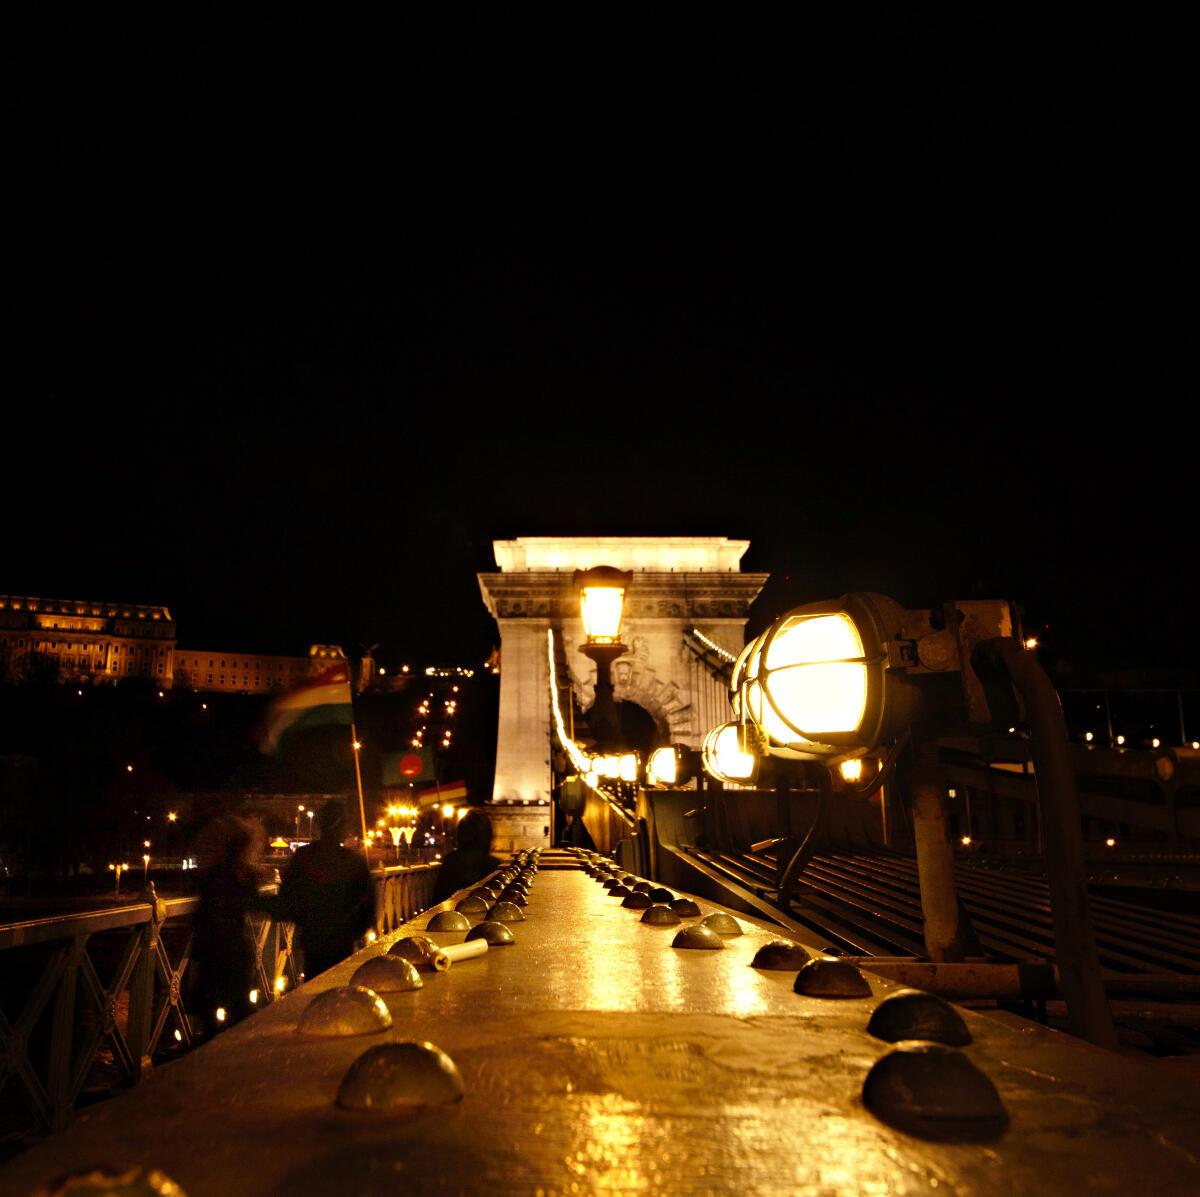 sejour-nuit-budapest-9